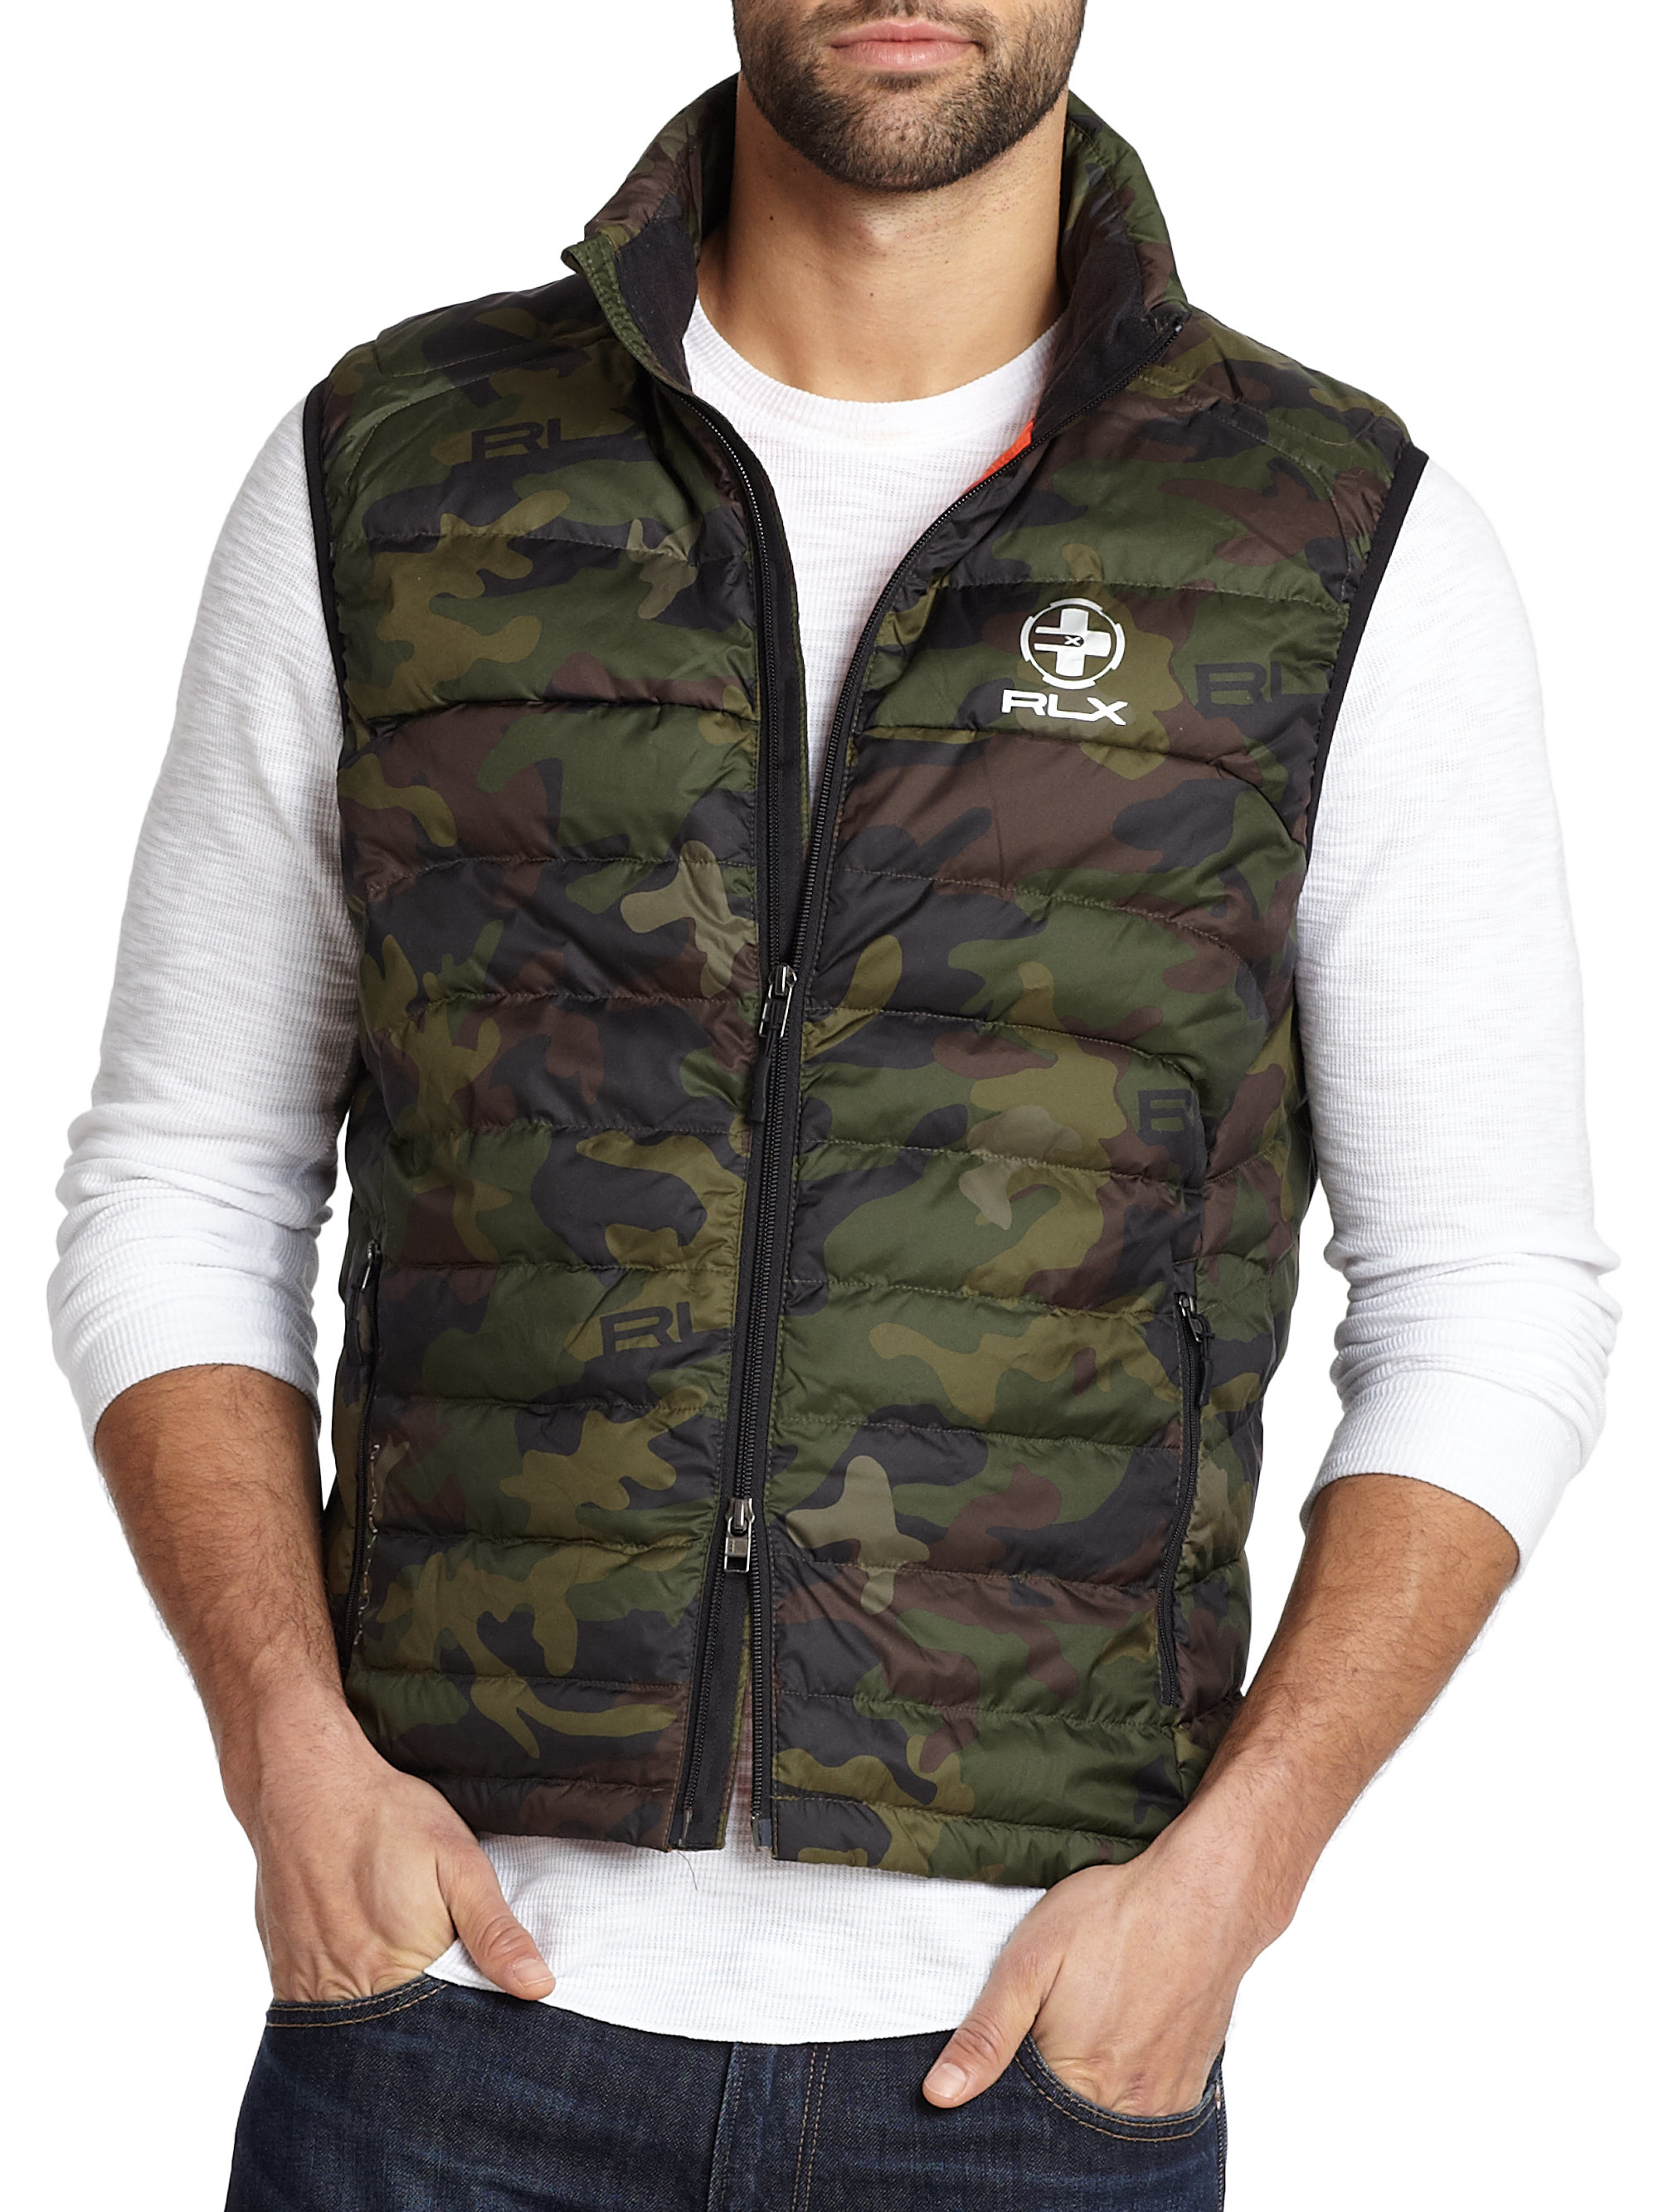 Polo Ralph Lauren Camouflage Explore Down Vest In Brown